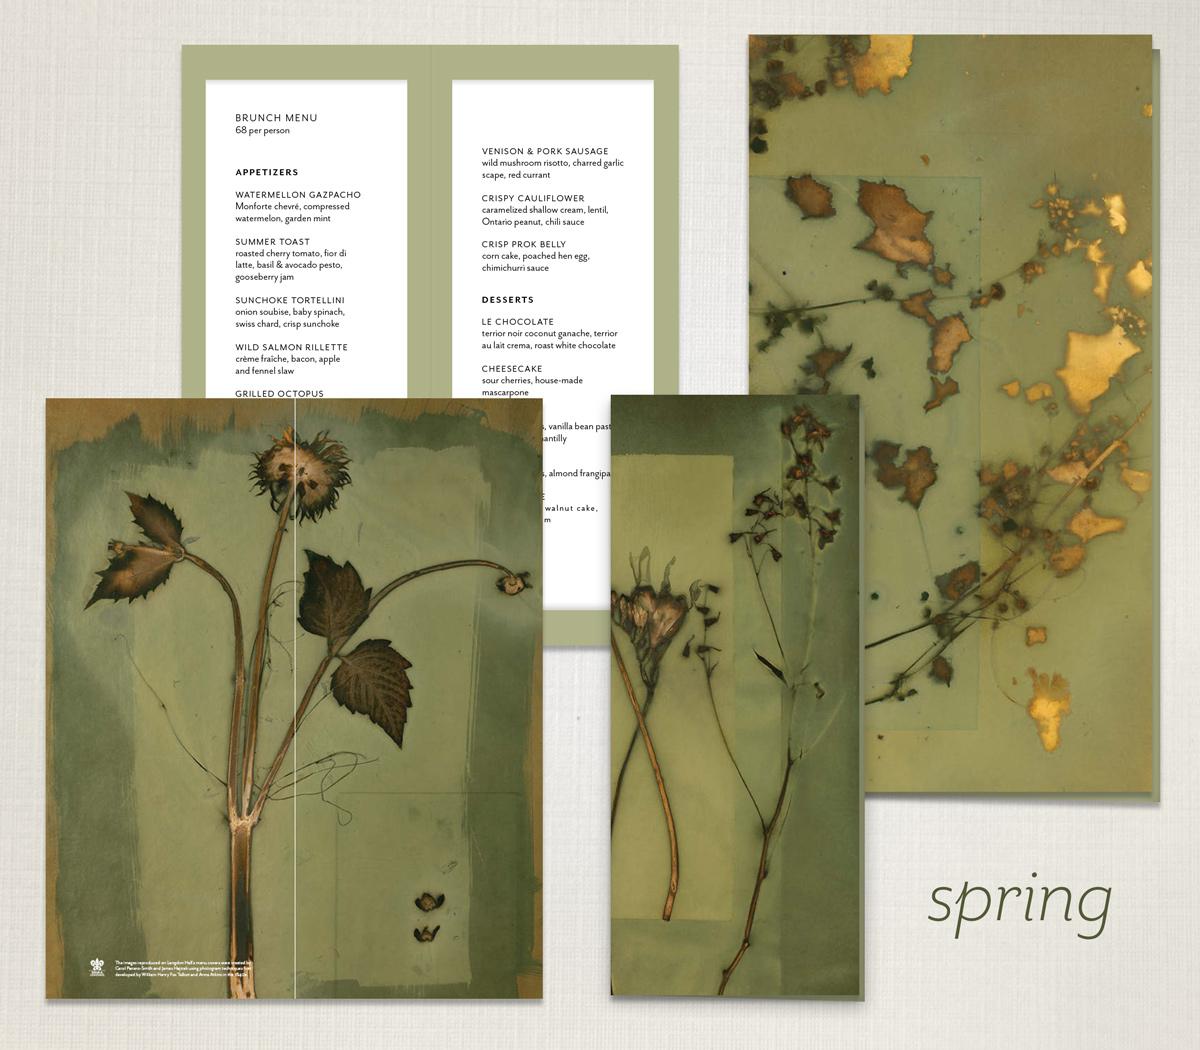 RESTAURANT-LH-spring-menus